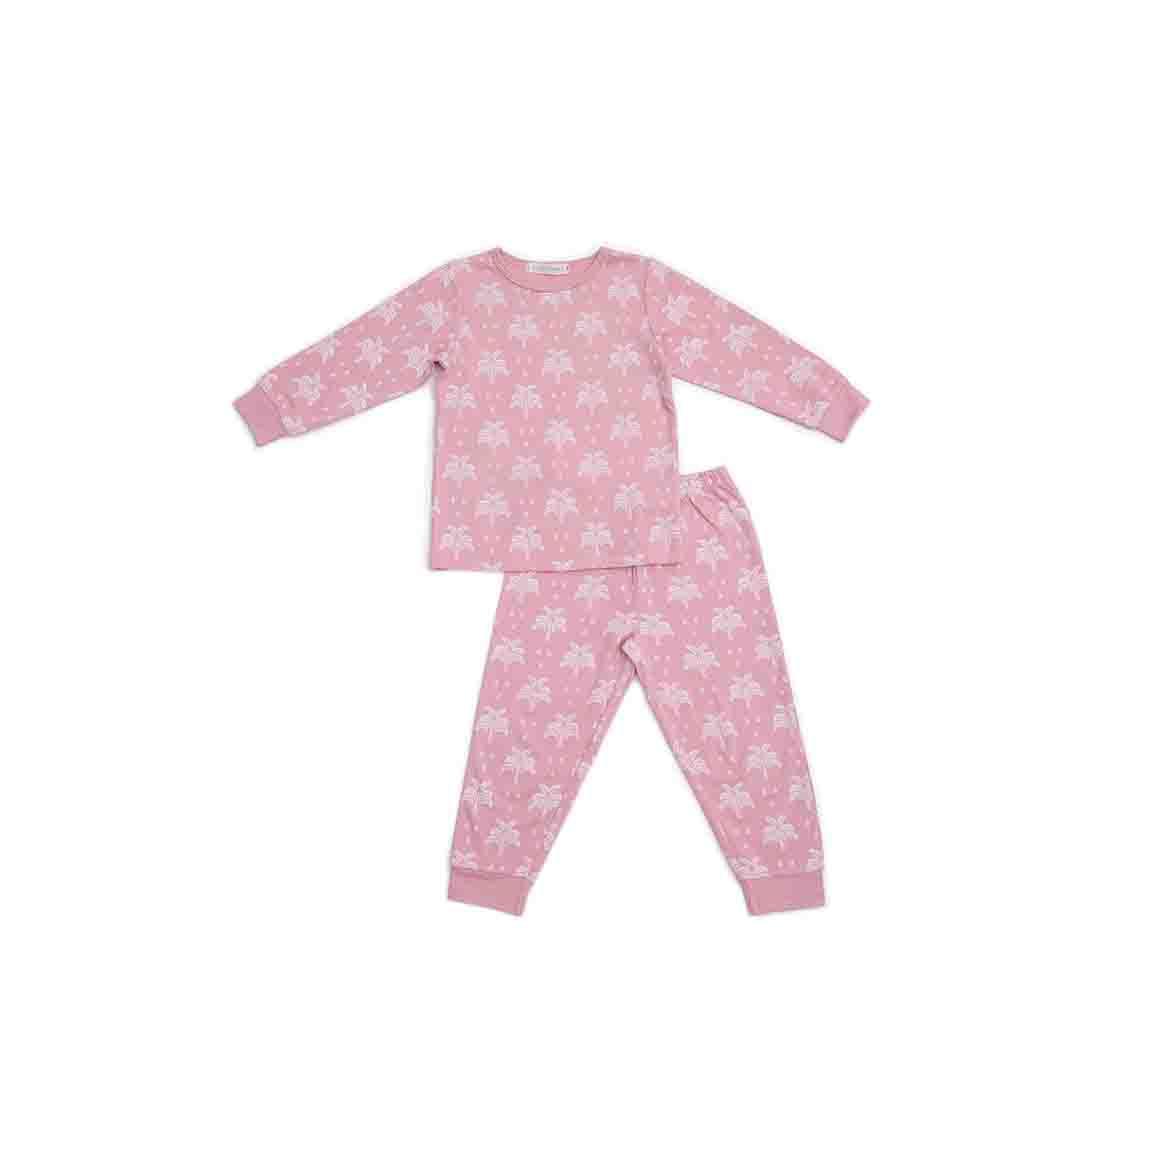 Autumn/Winter Childrens Pyjama Set - Blush Pink in Palms and Pineapple Print   Trada Marketplace